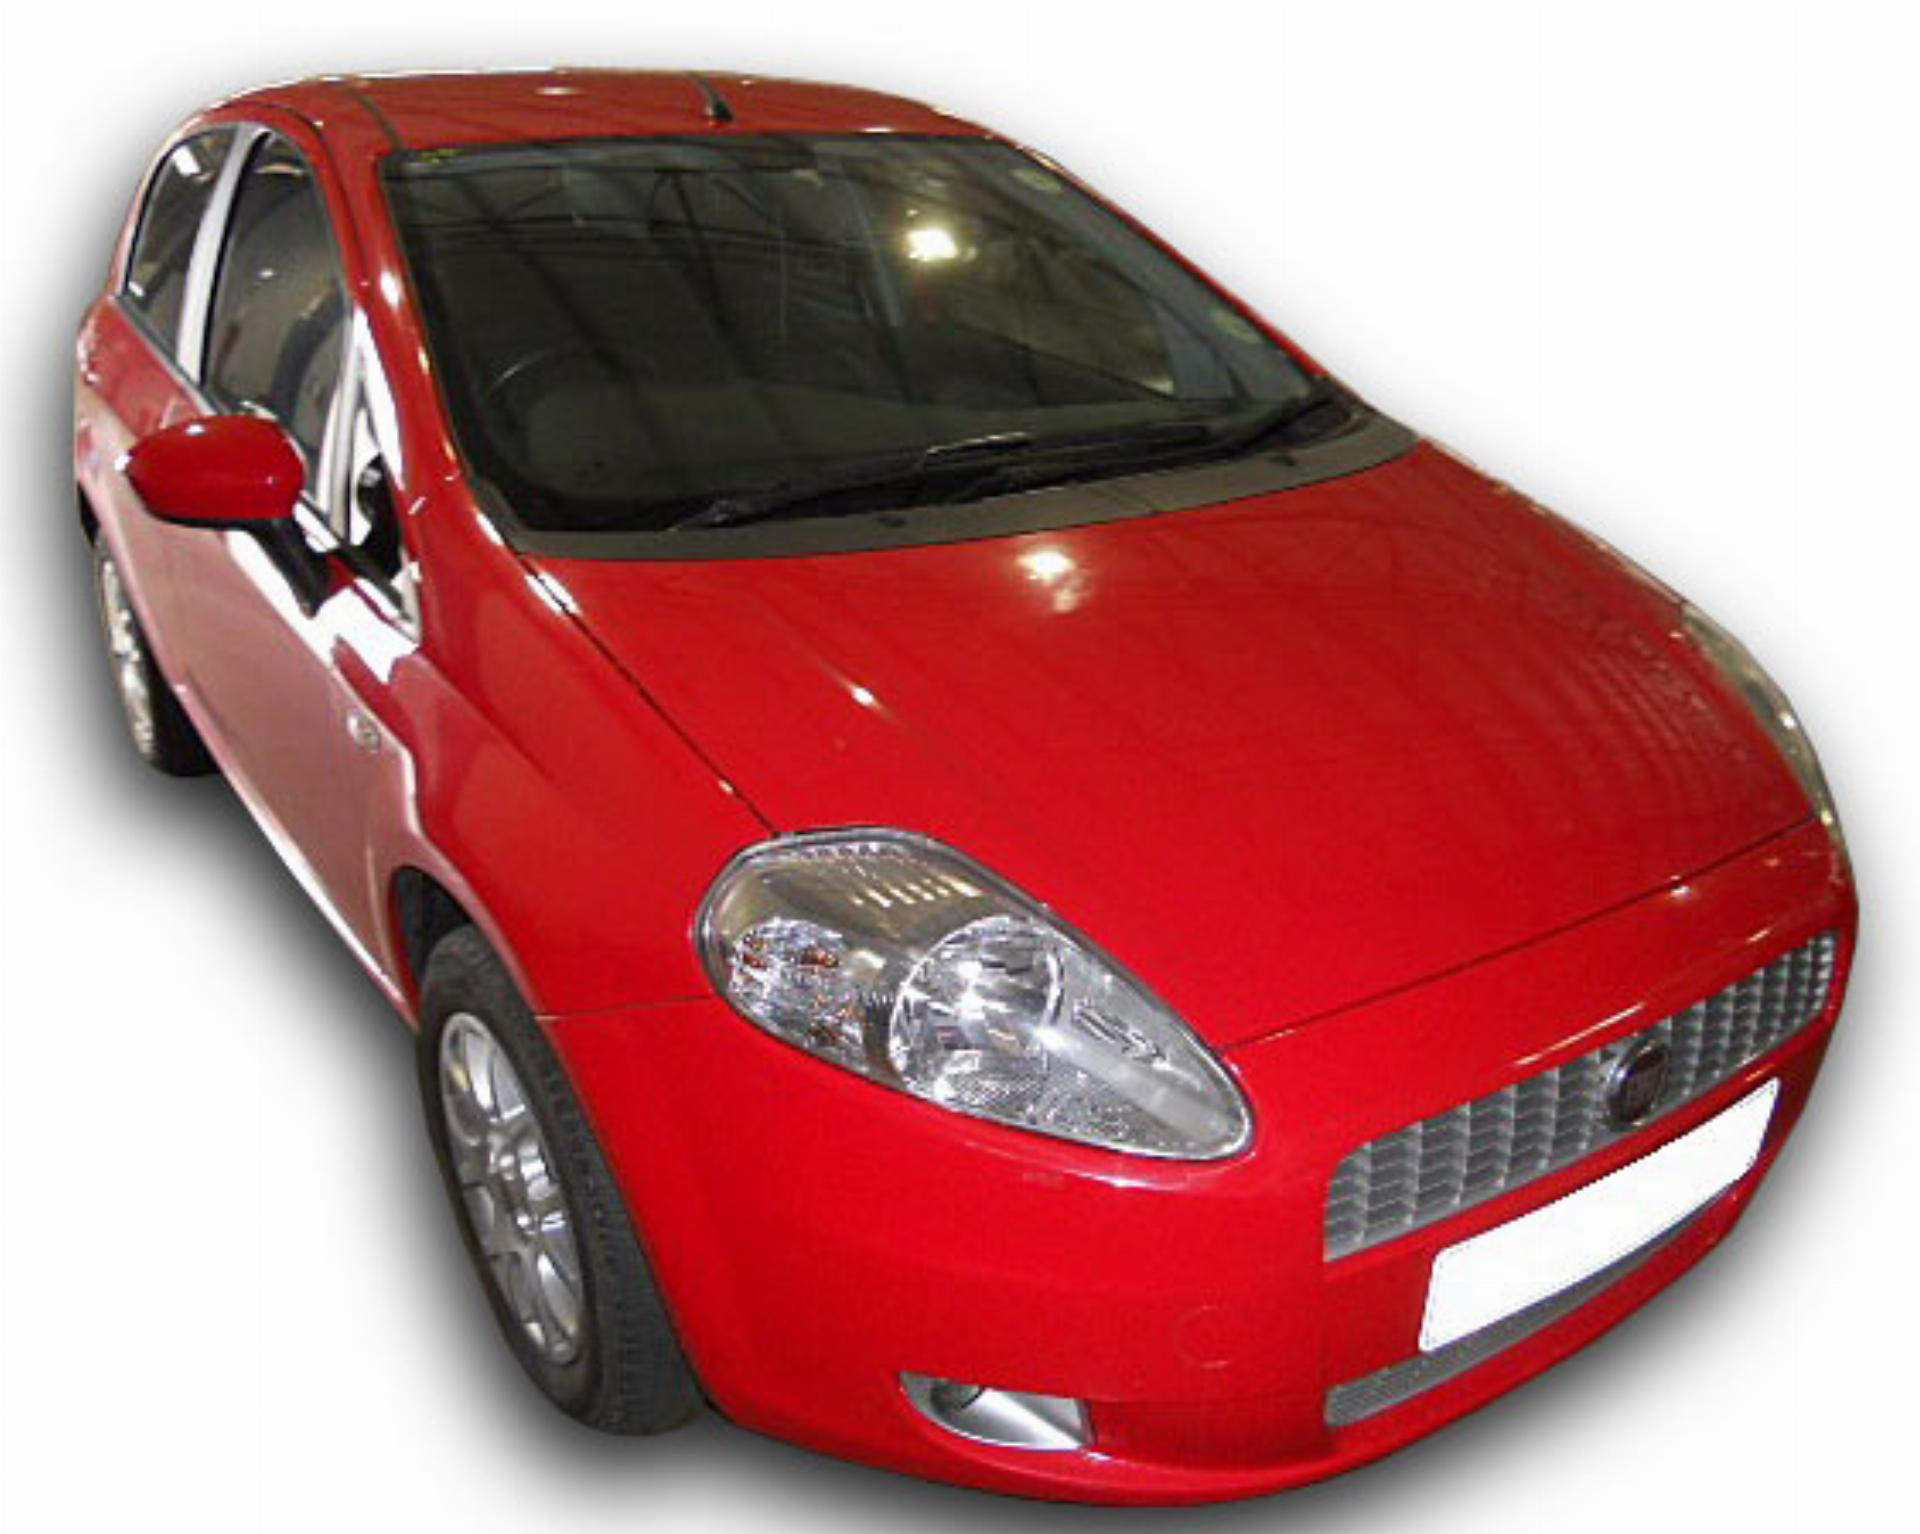 Fiat Punto 1.4 Emotion 5 Door